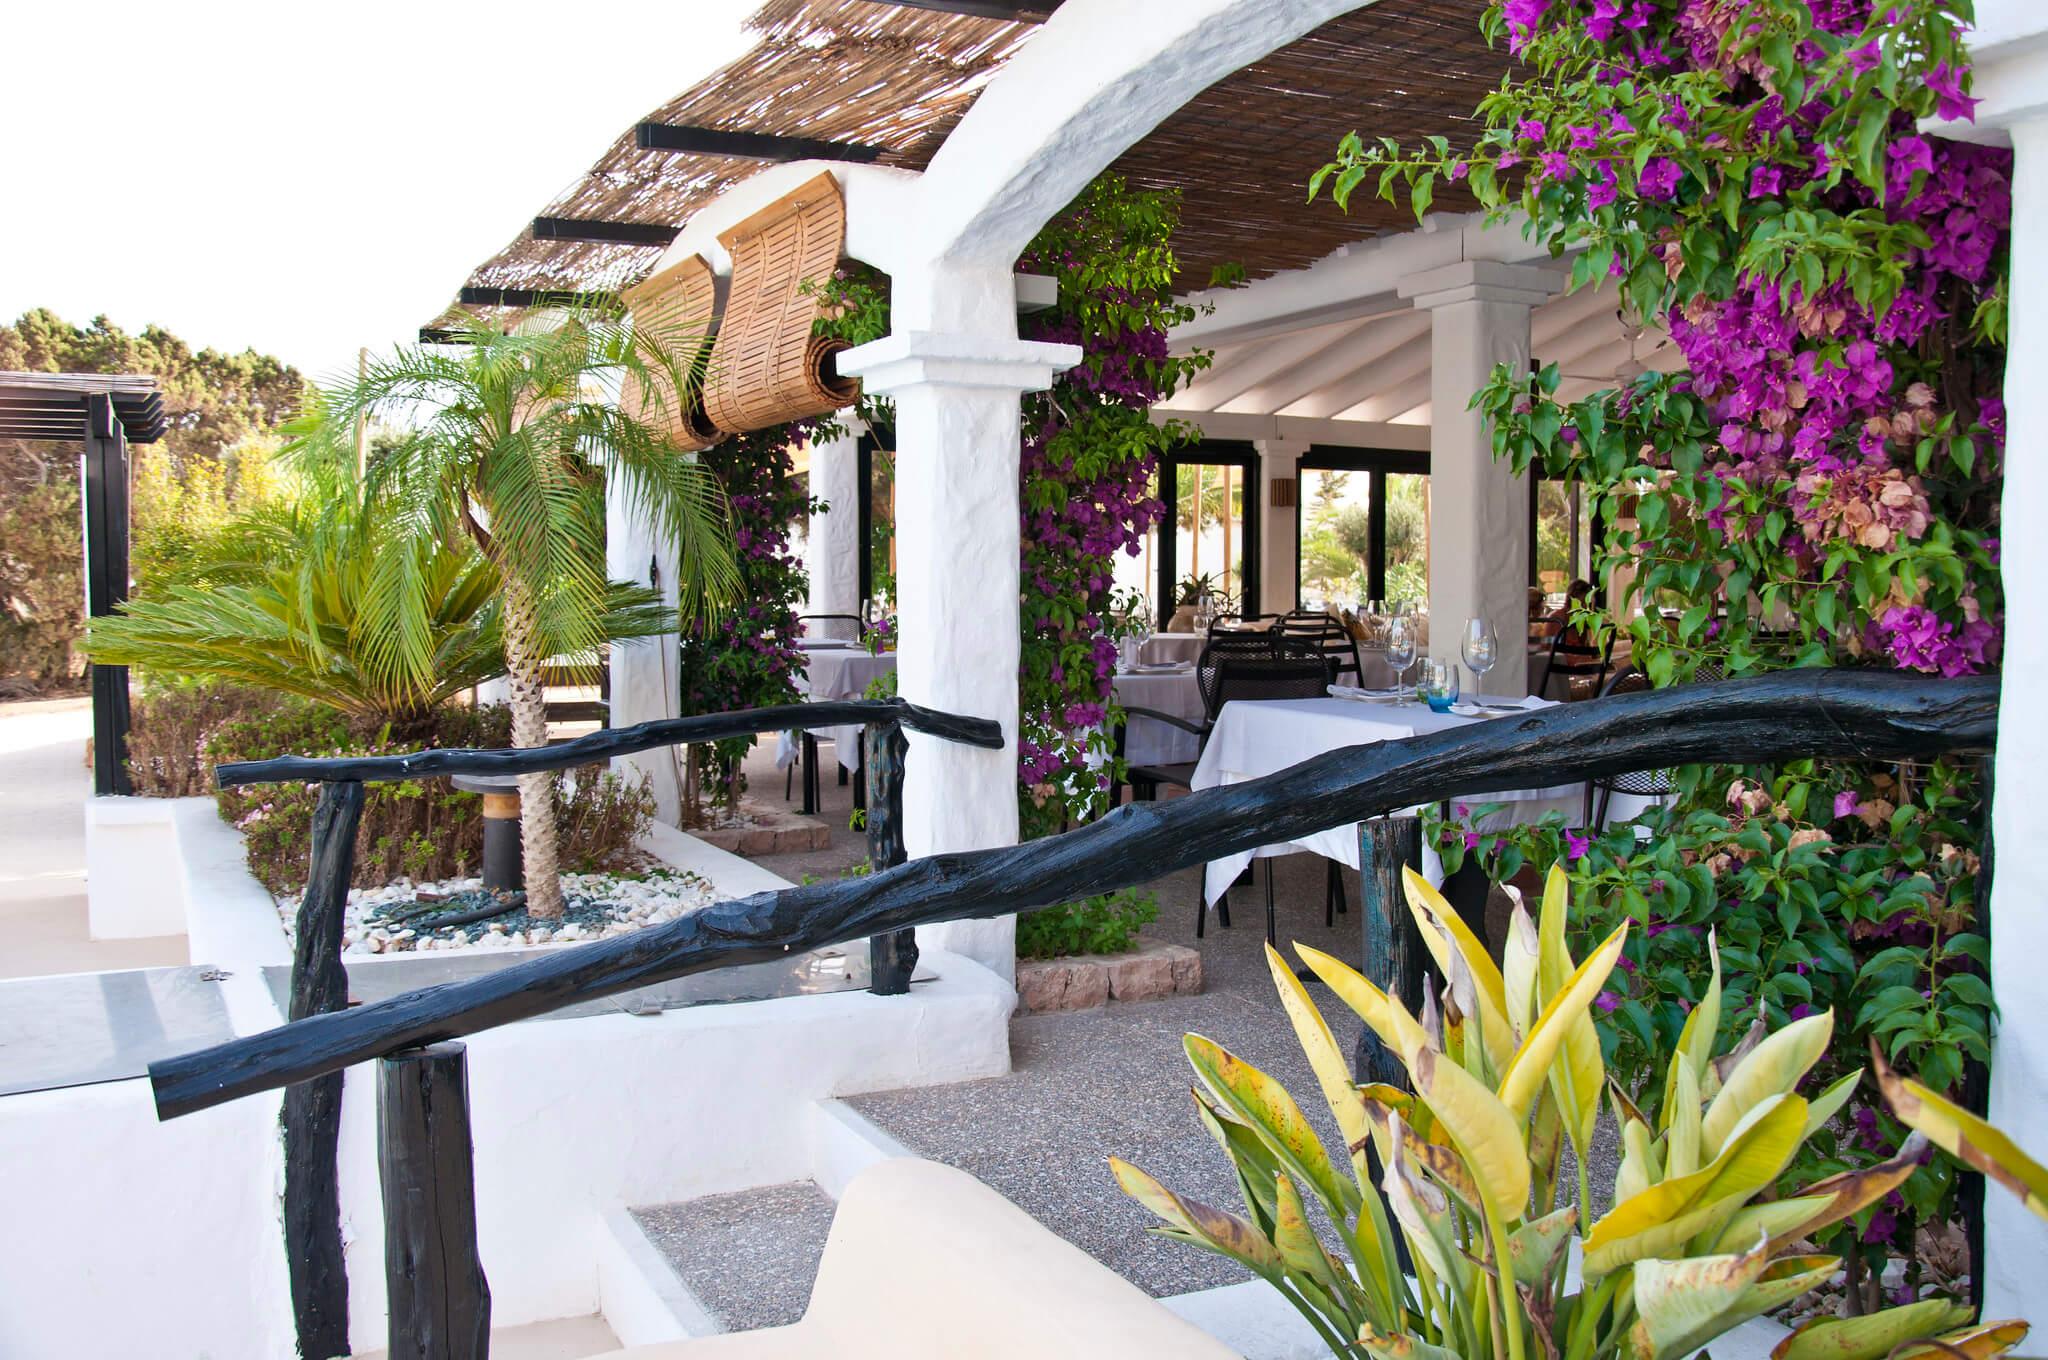 https://www.white-ibiza.com/wp-content/uploads/2020/03/formentera-restaurants-marlaca-2020-01.jpg